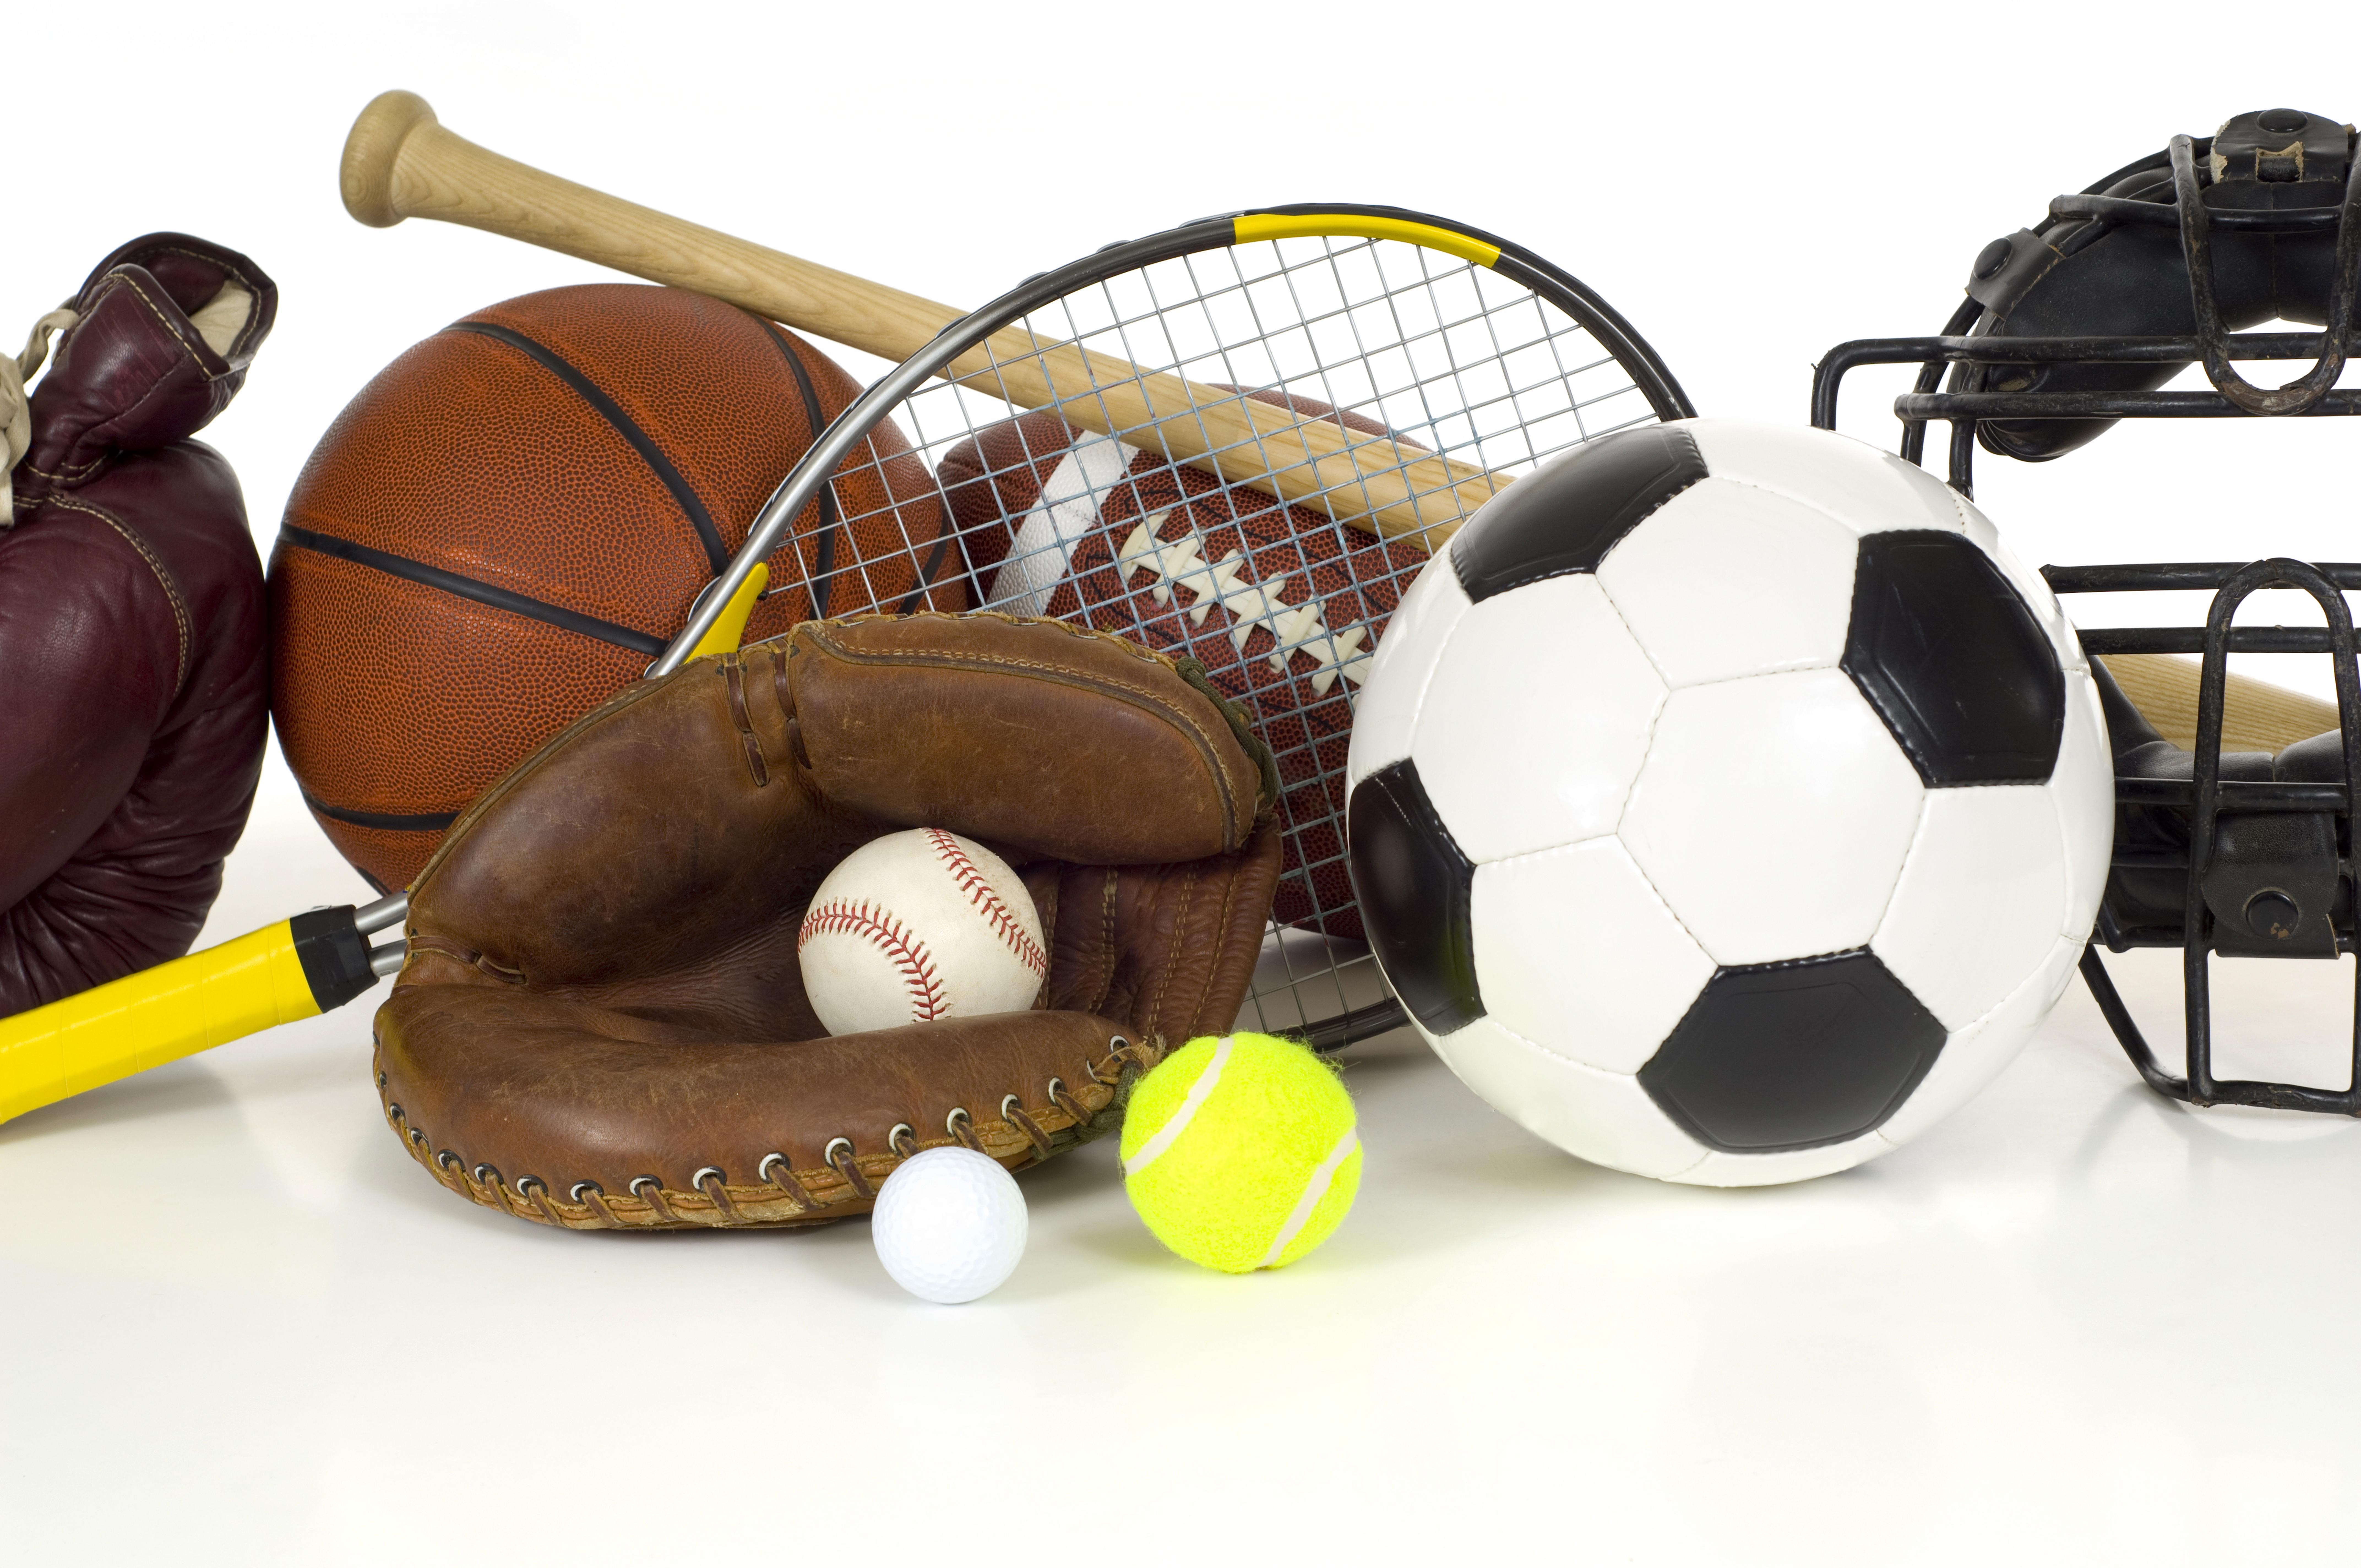 All sports equipment